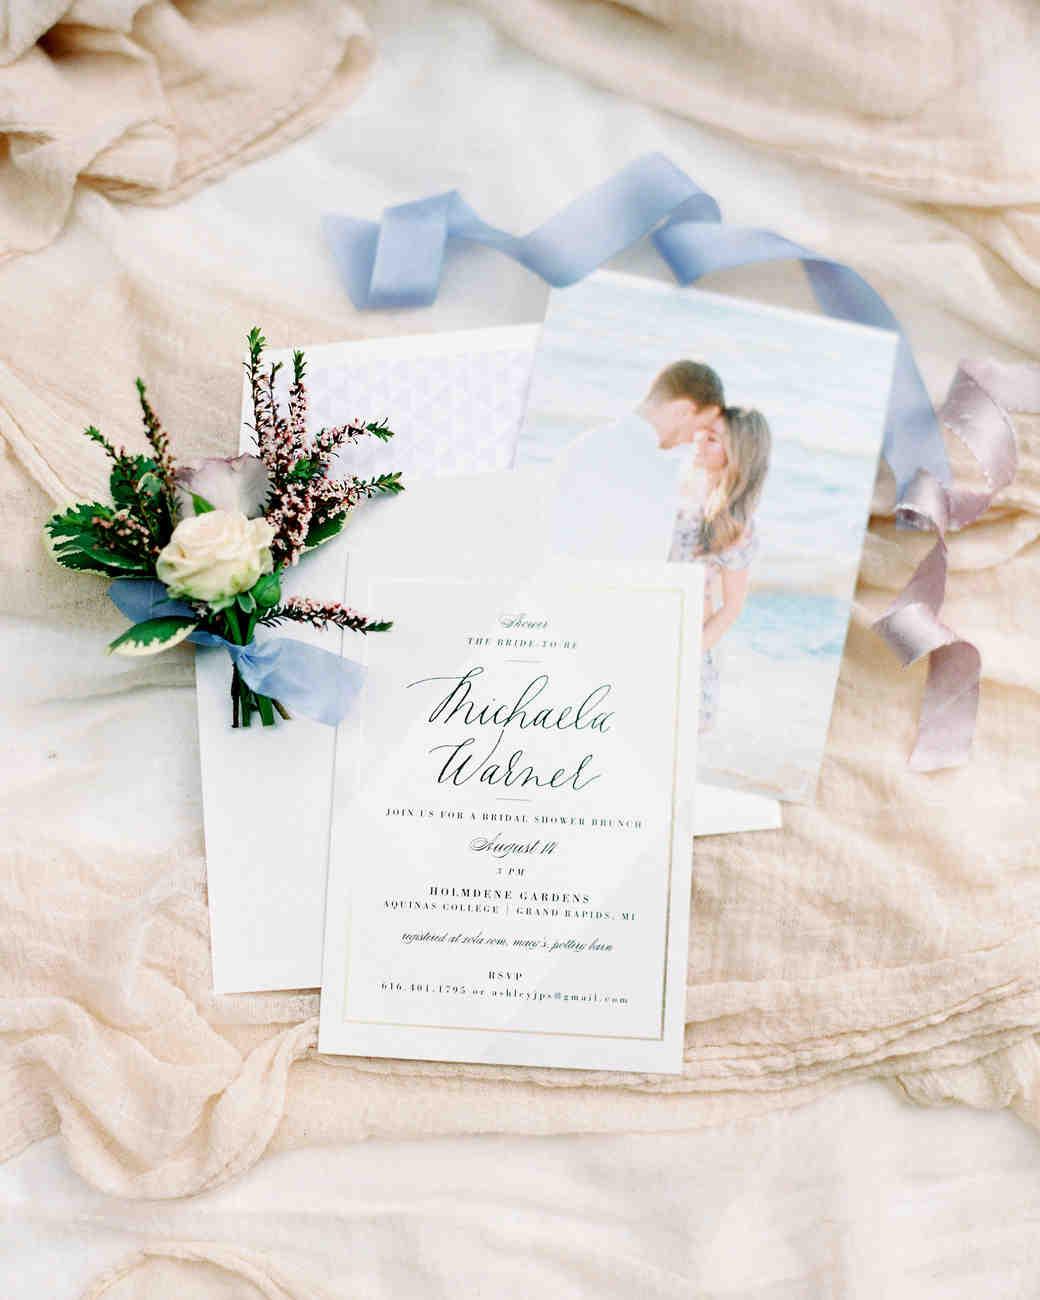 Bridal Shower Invitations We Absolutely Love Martha Stewart Weddings